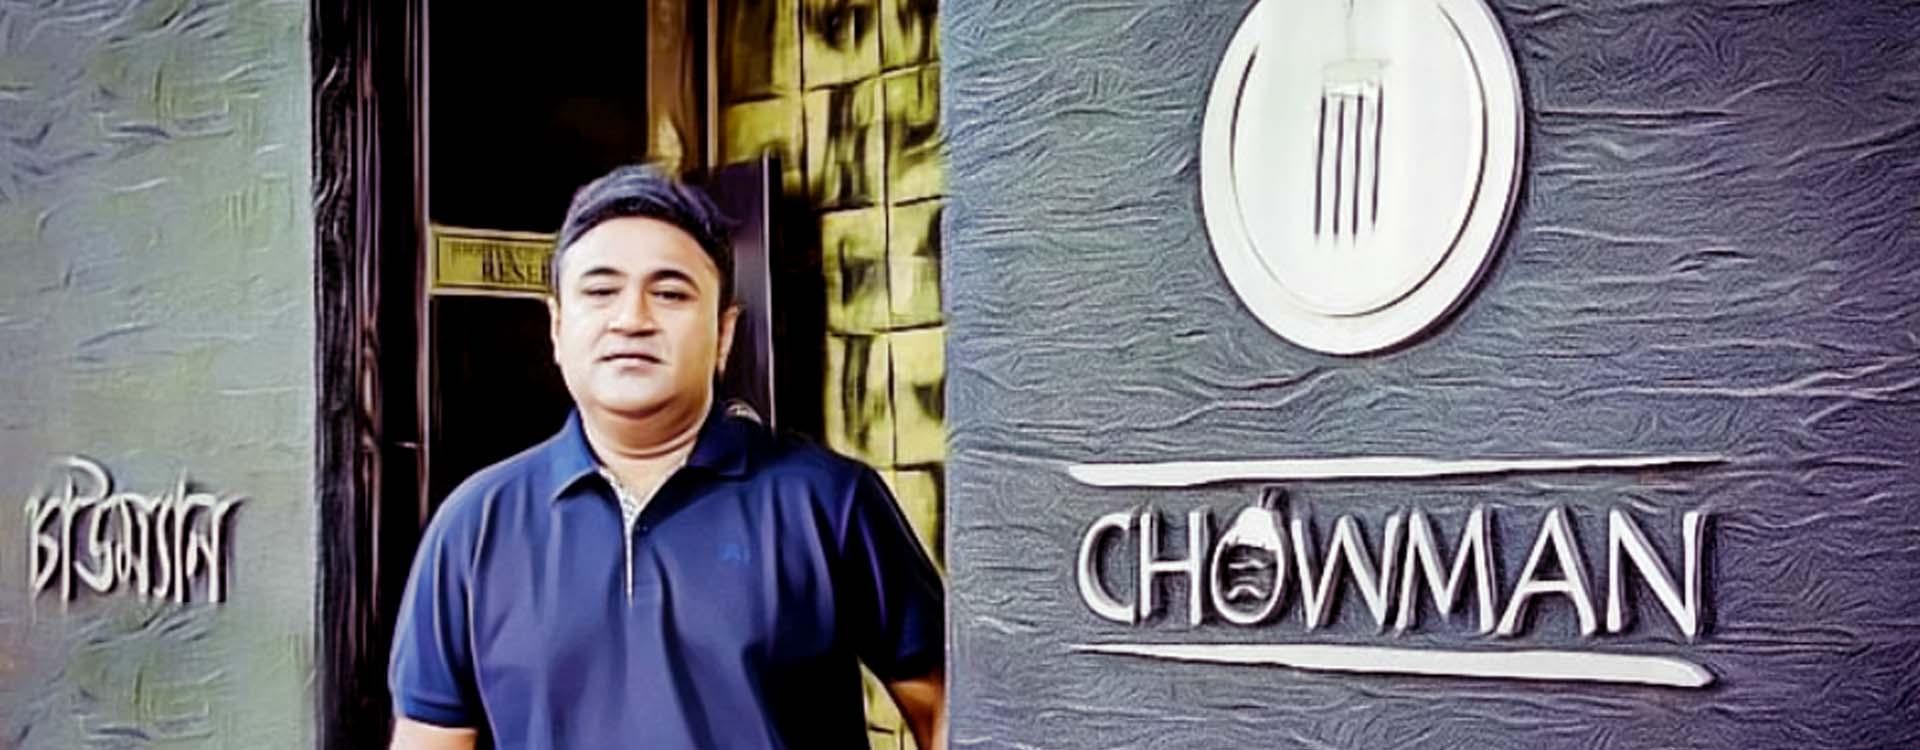 The Founder of Chowman-Debaditya Choudhury